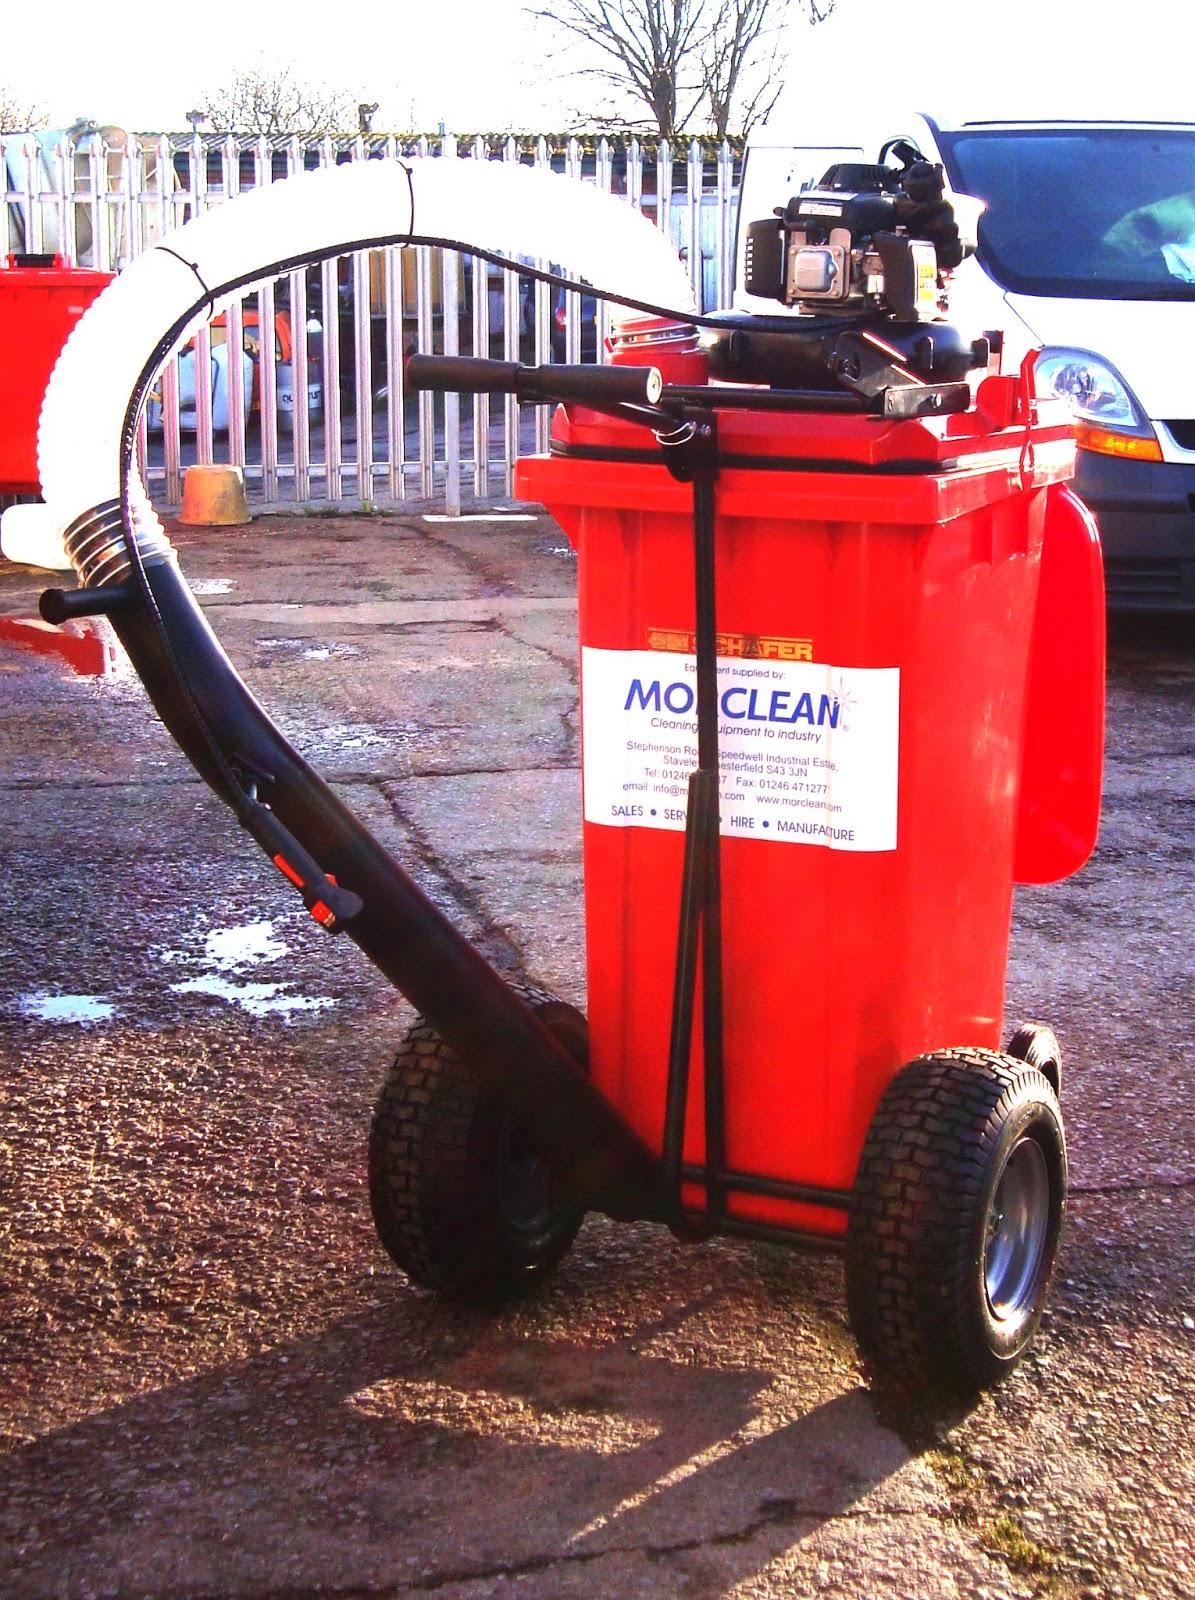 Morclean Morclean Super 240 Trolley Litter Vacuum Pack